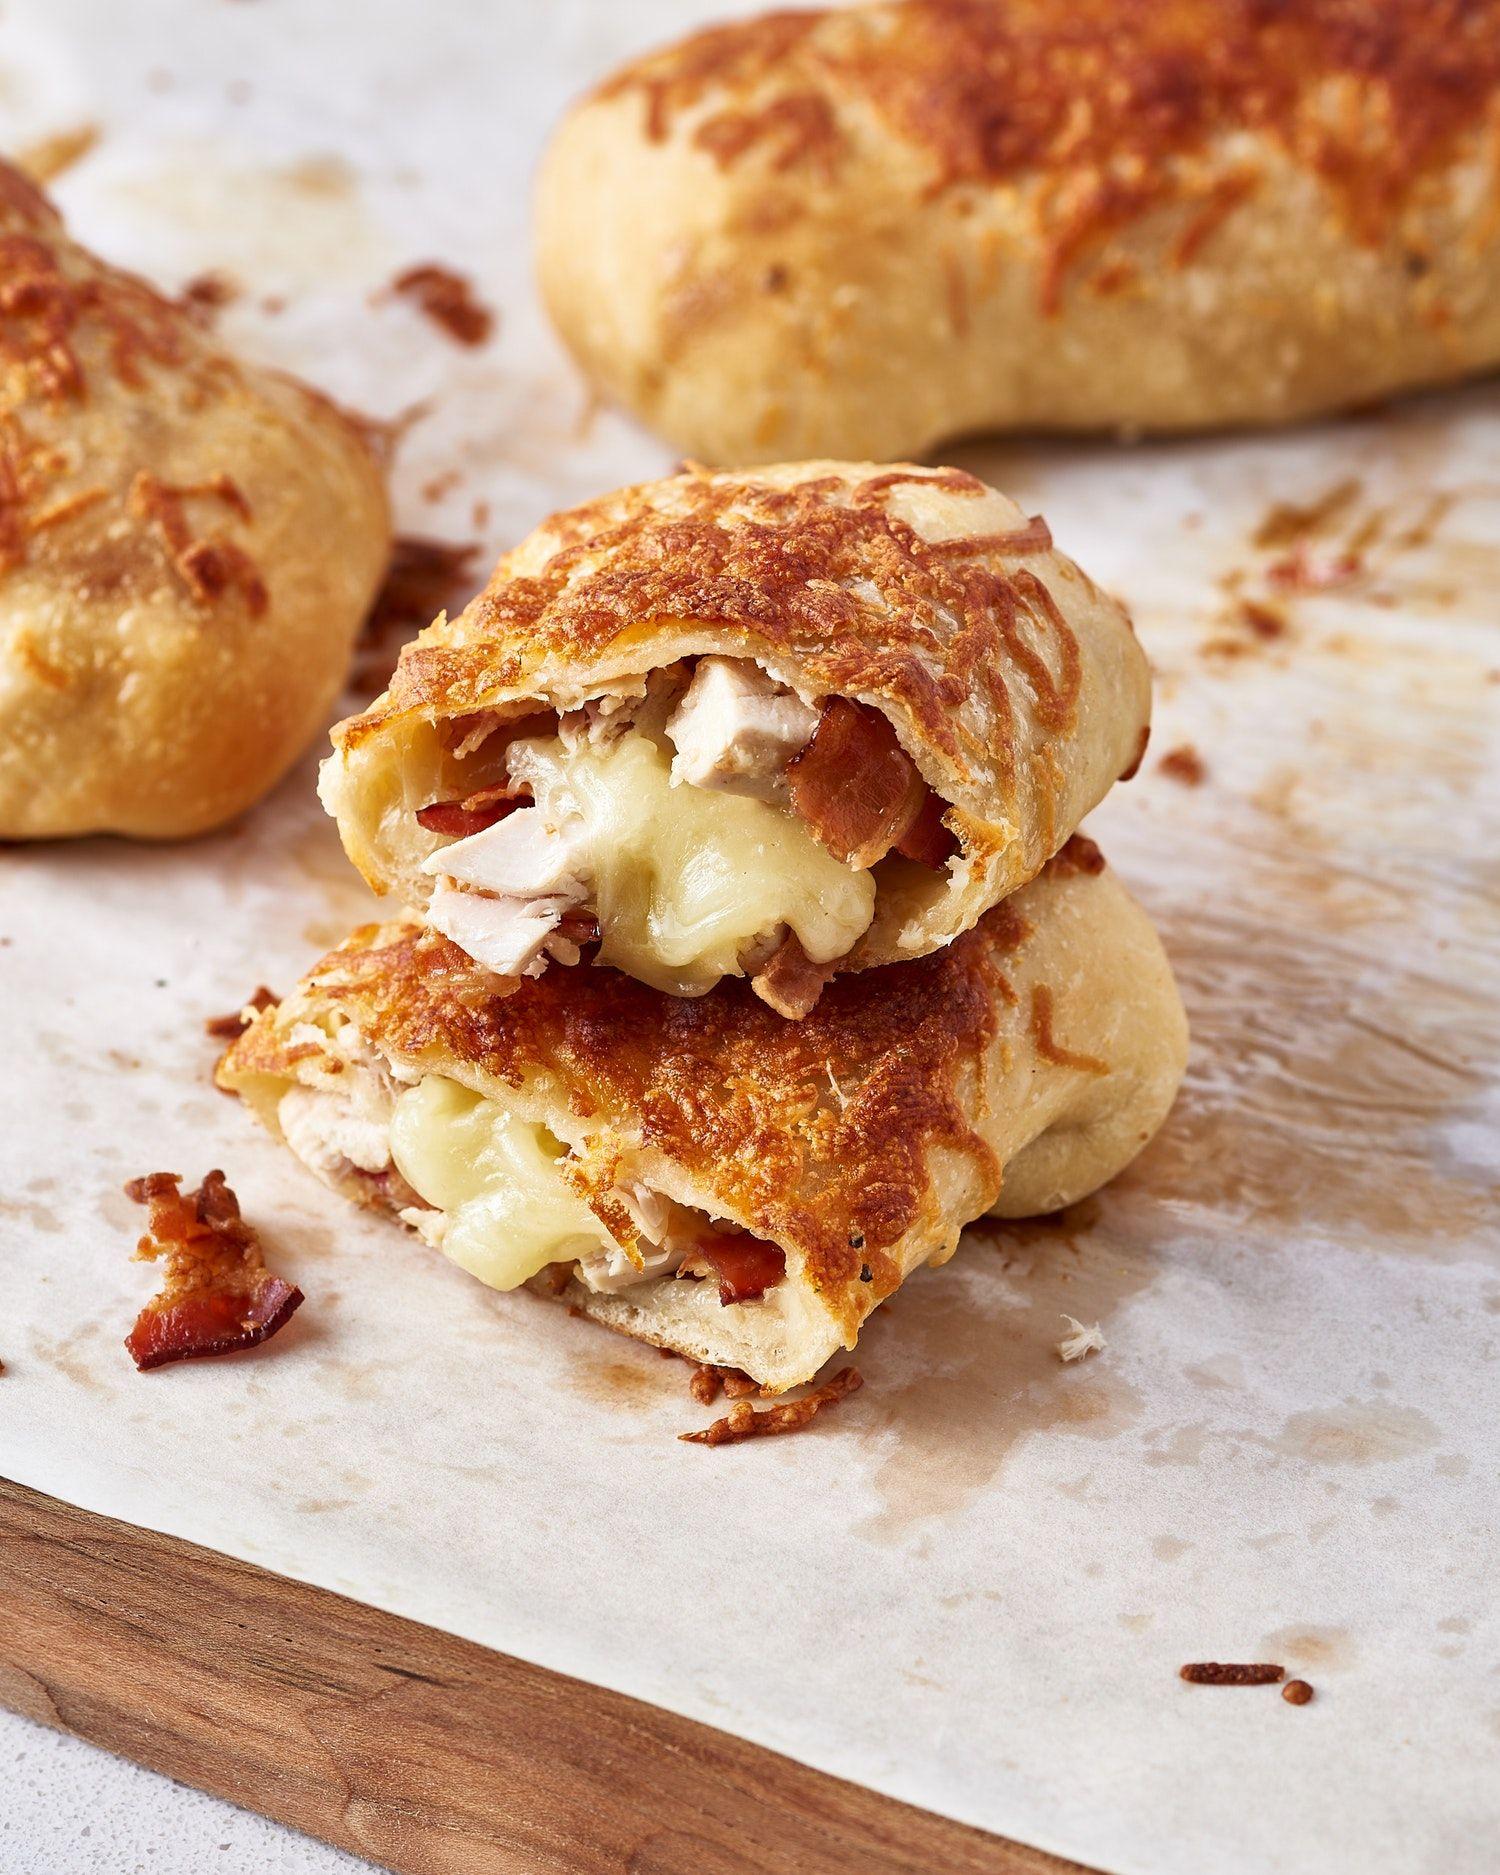 Costco Chicken Bakes Recipe Costco Chicken Bake Costco